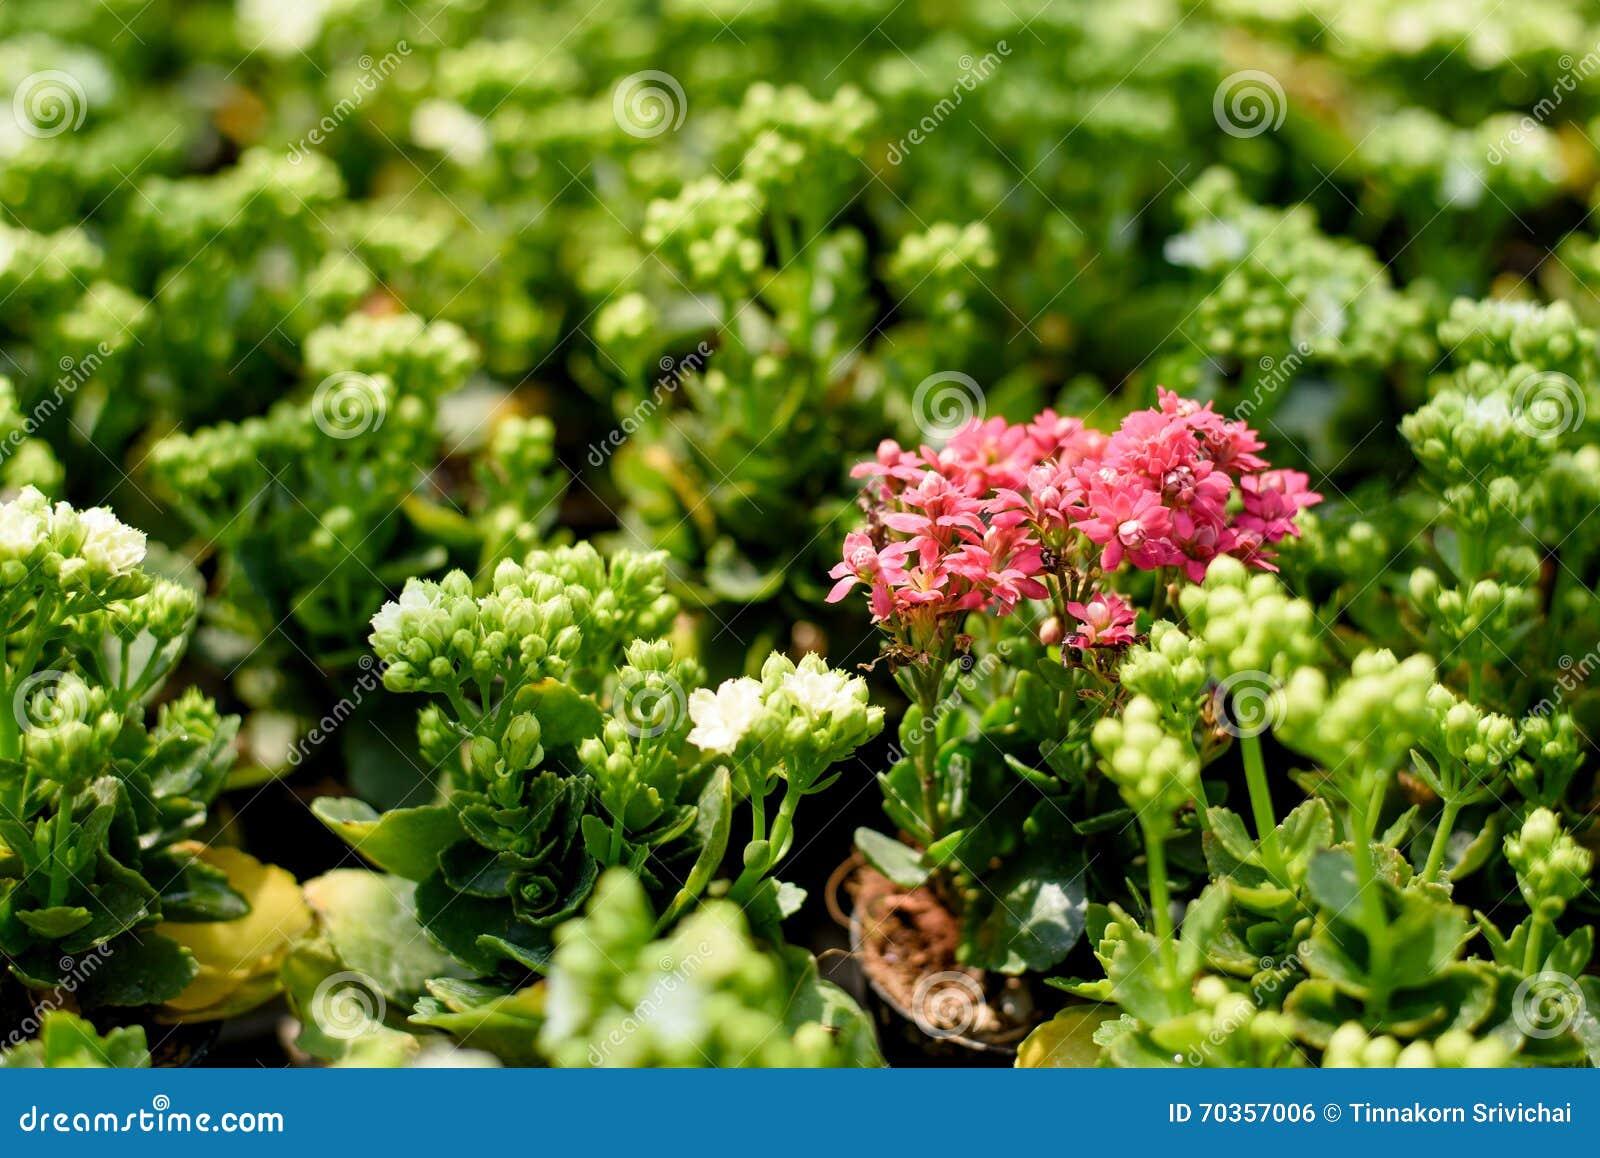 Green plants online shopping